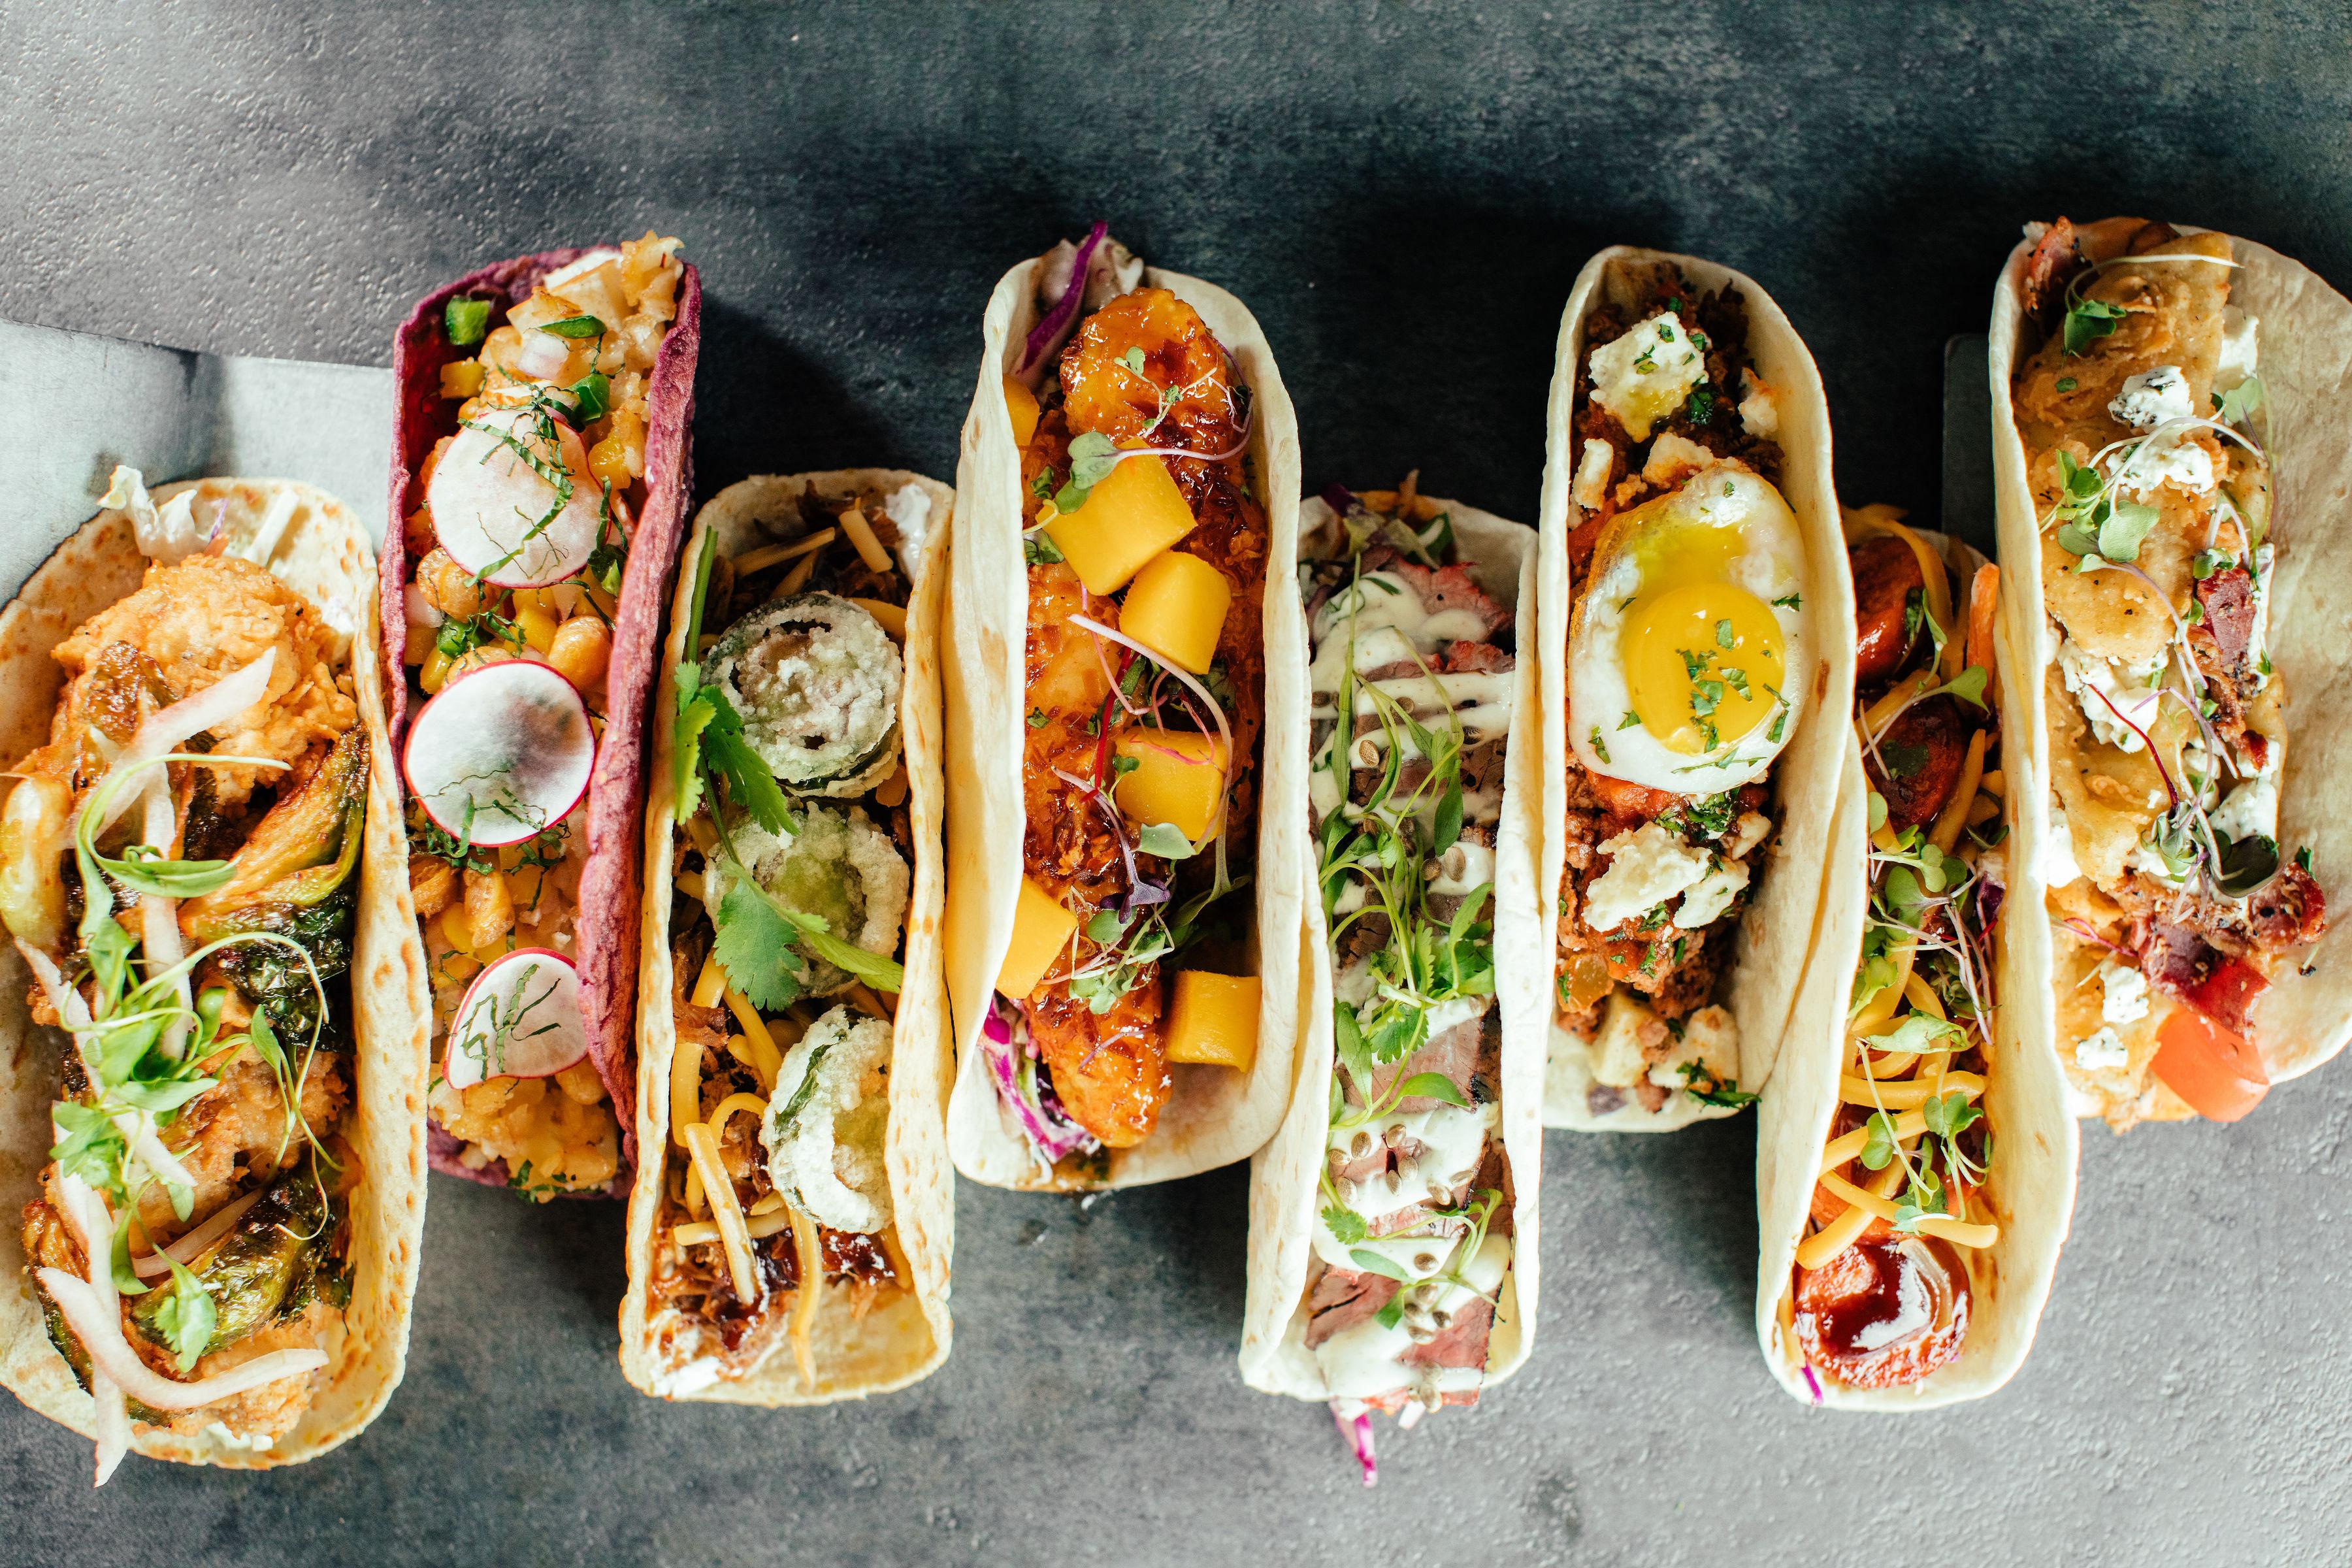 A row of various eight flour tortilla tacos